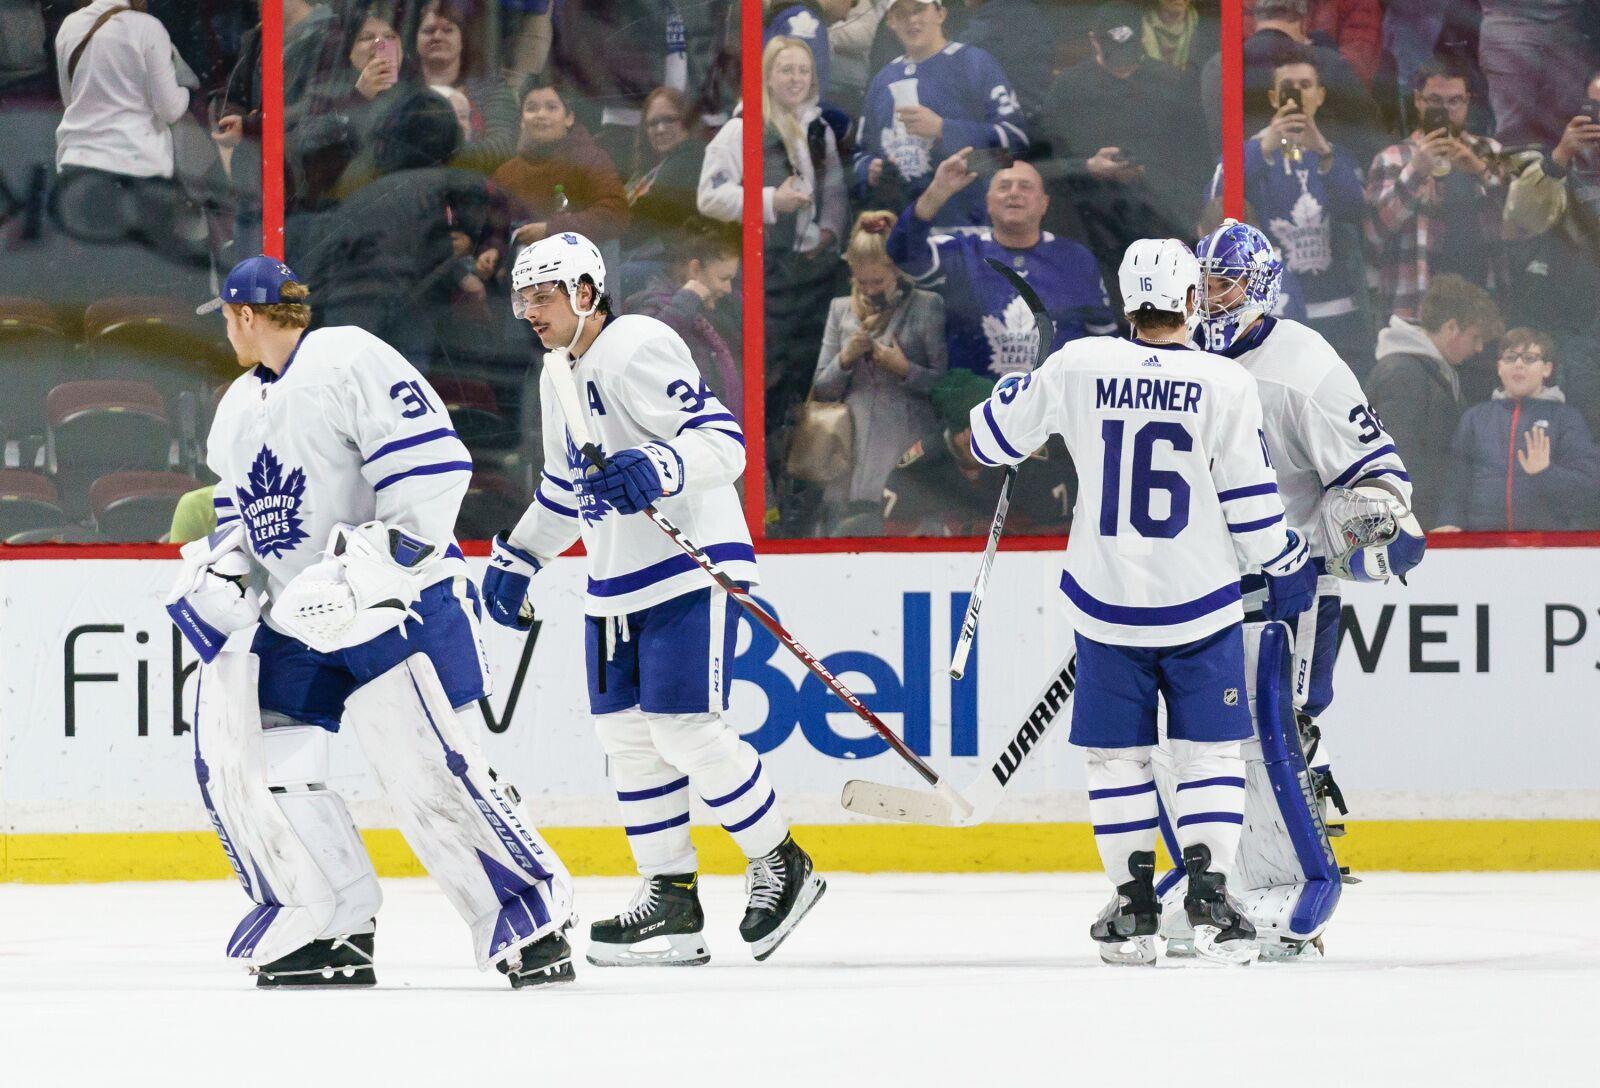 Toronto Maple Leafs: Campbell win again, Matthews keeps scoring pace